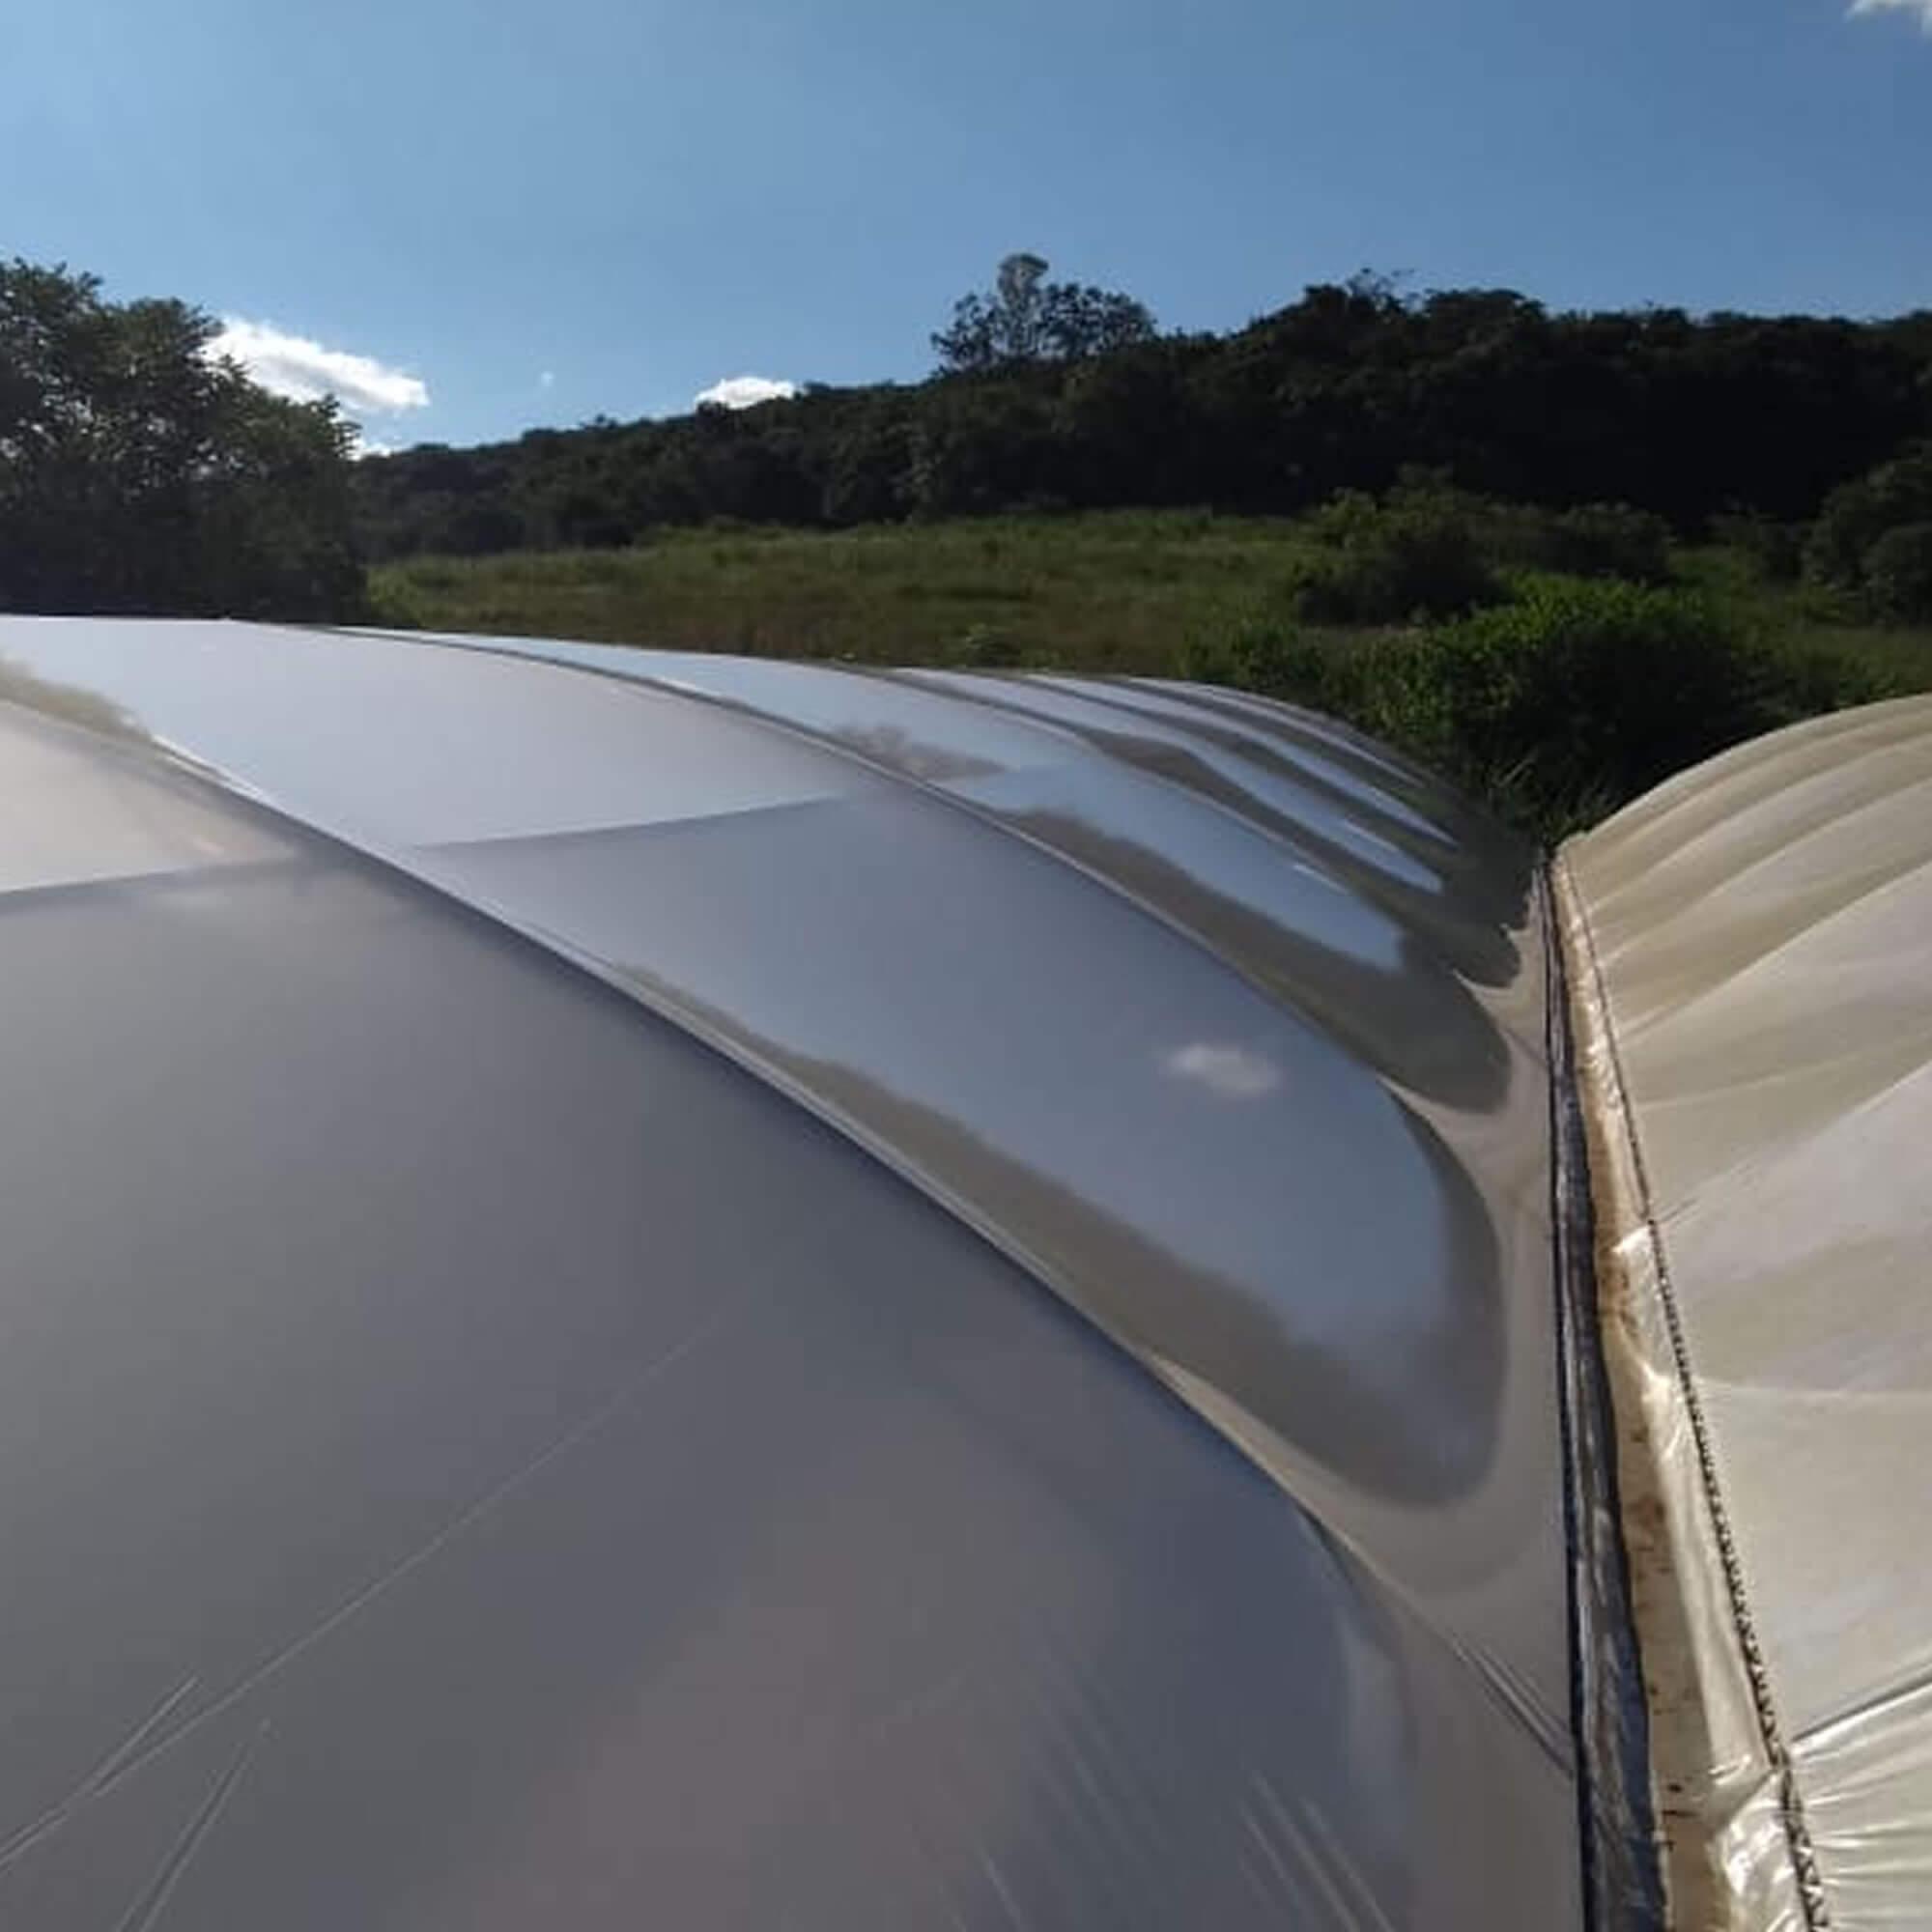 Filme Plástico Difusor para Estufa - 10x60 metros - 120 micras - Politiv